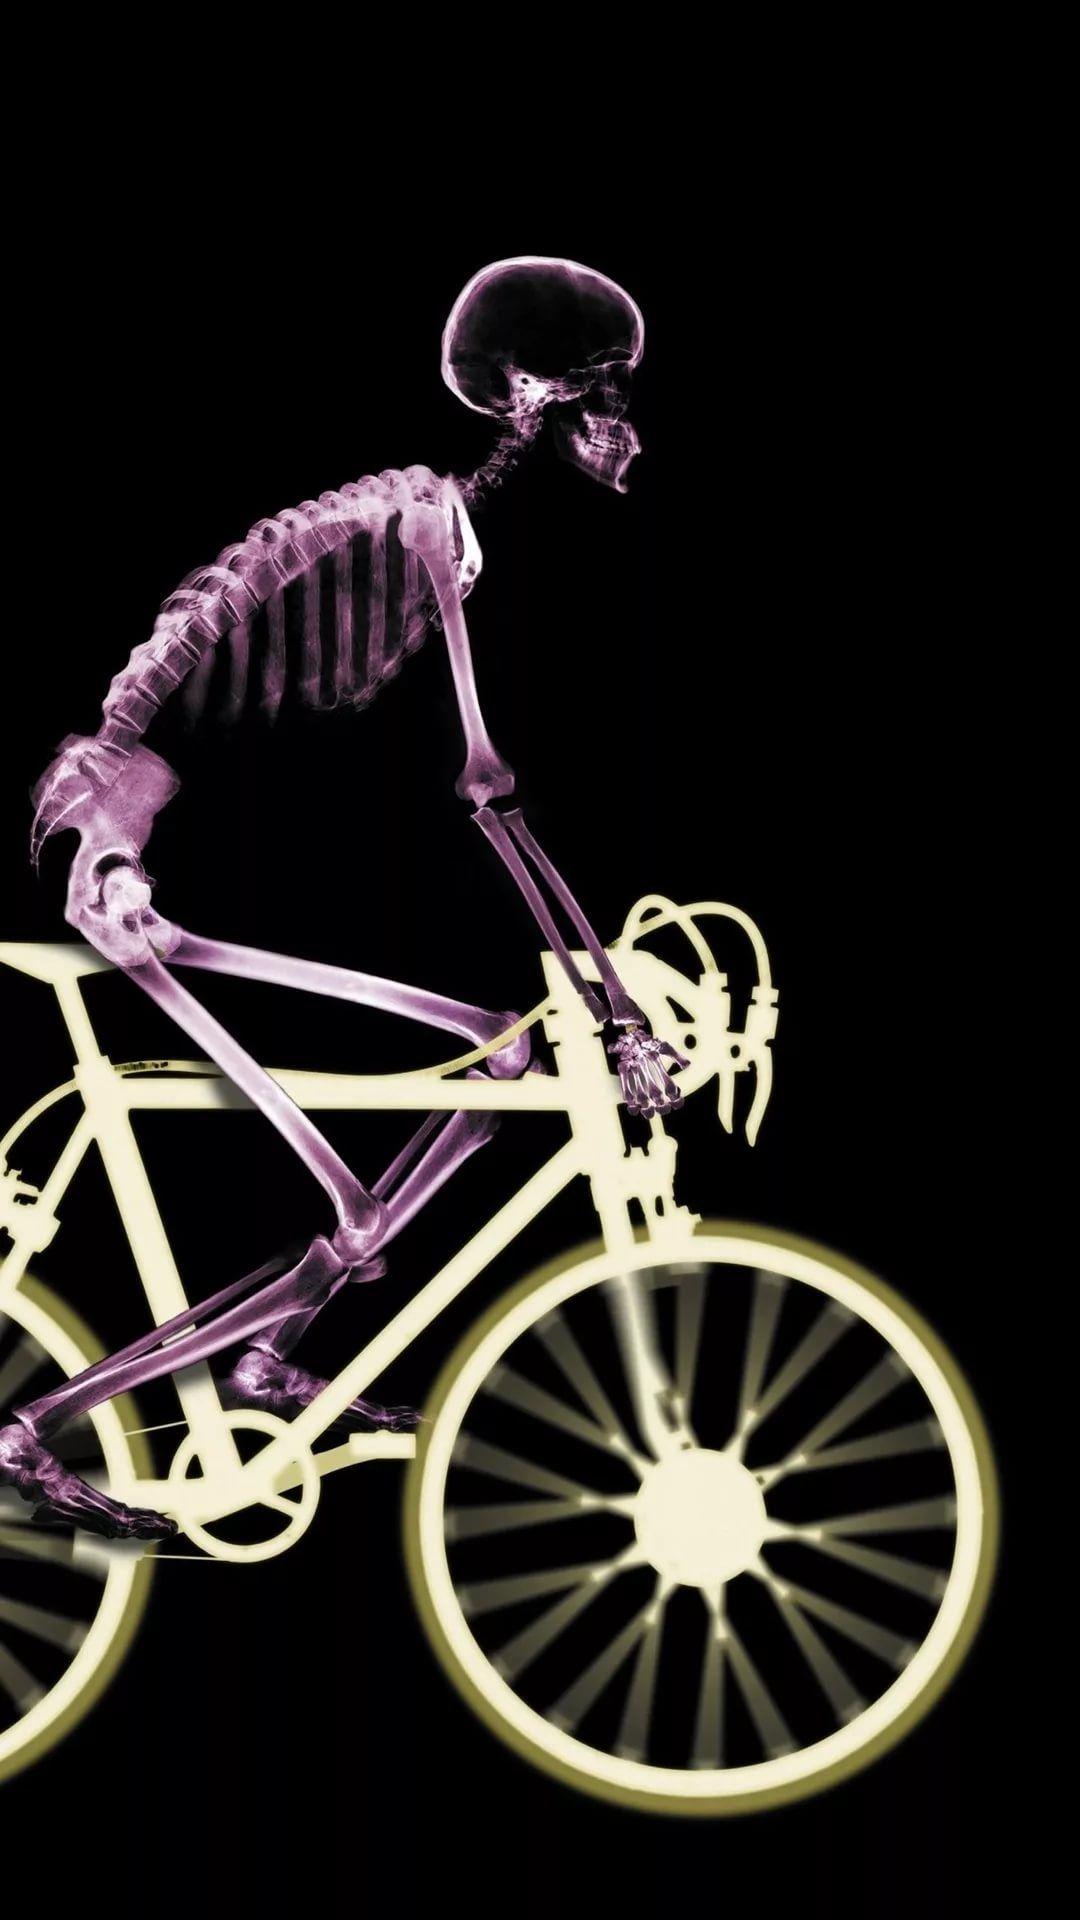 Skeleton iPhone x wallpaper